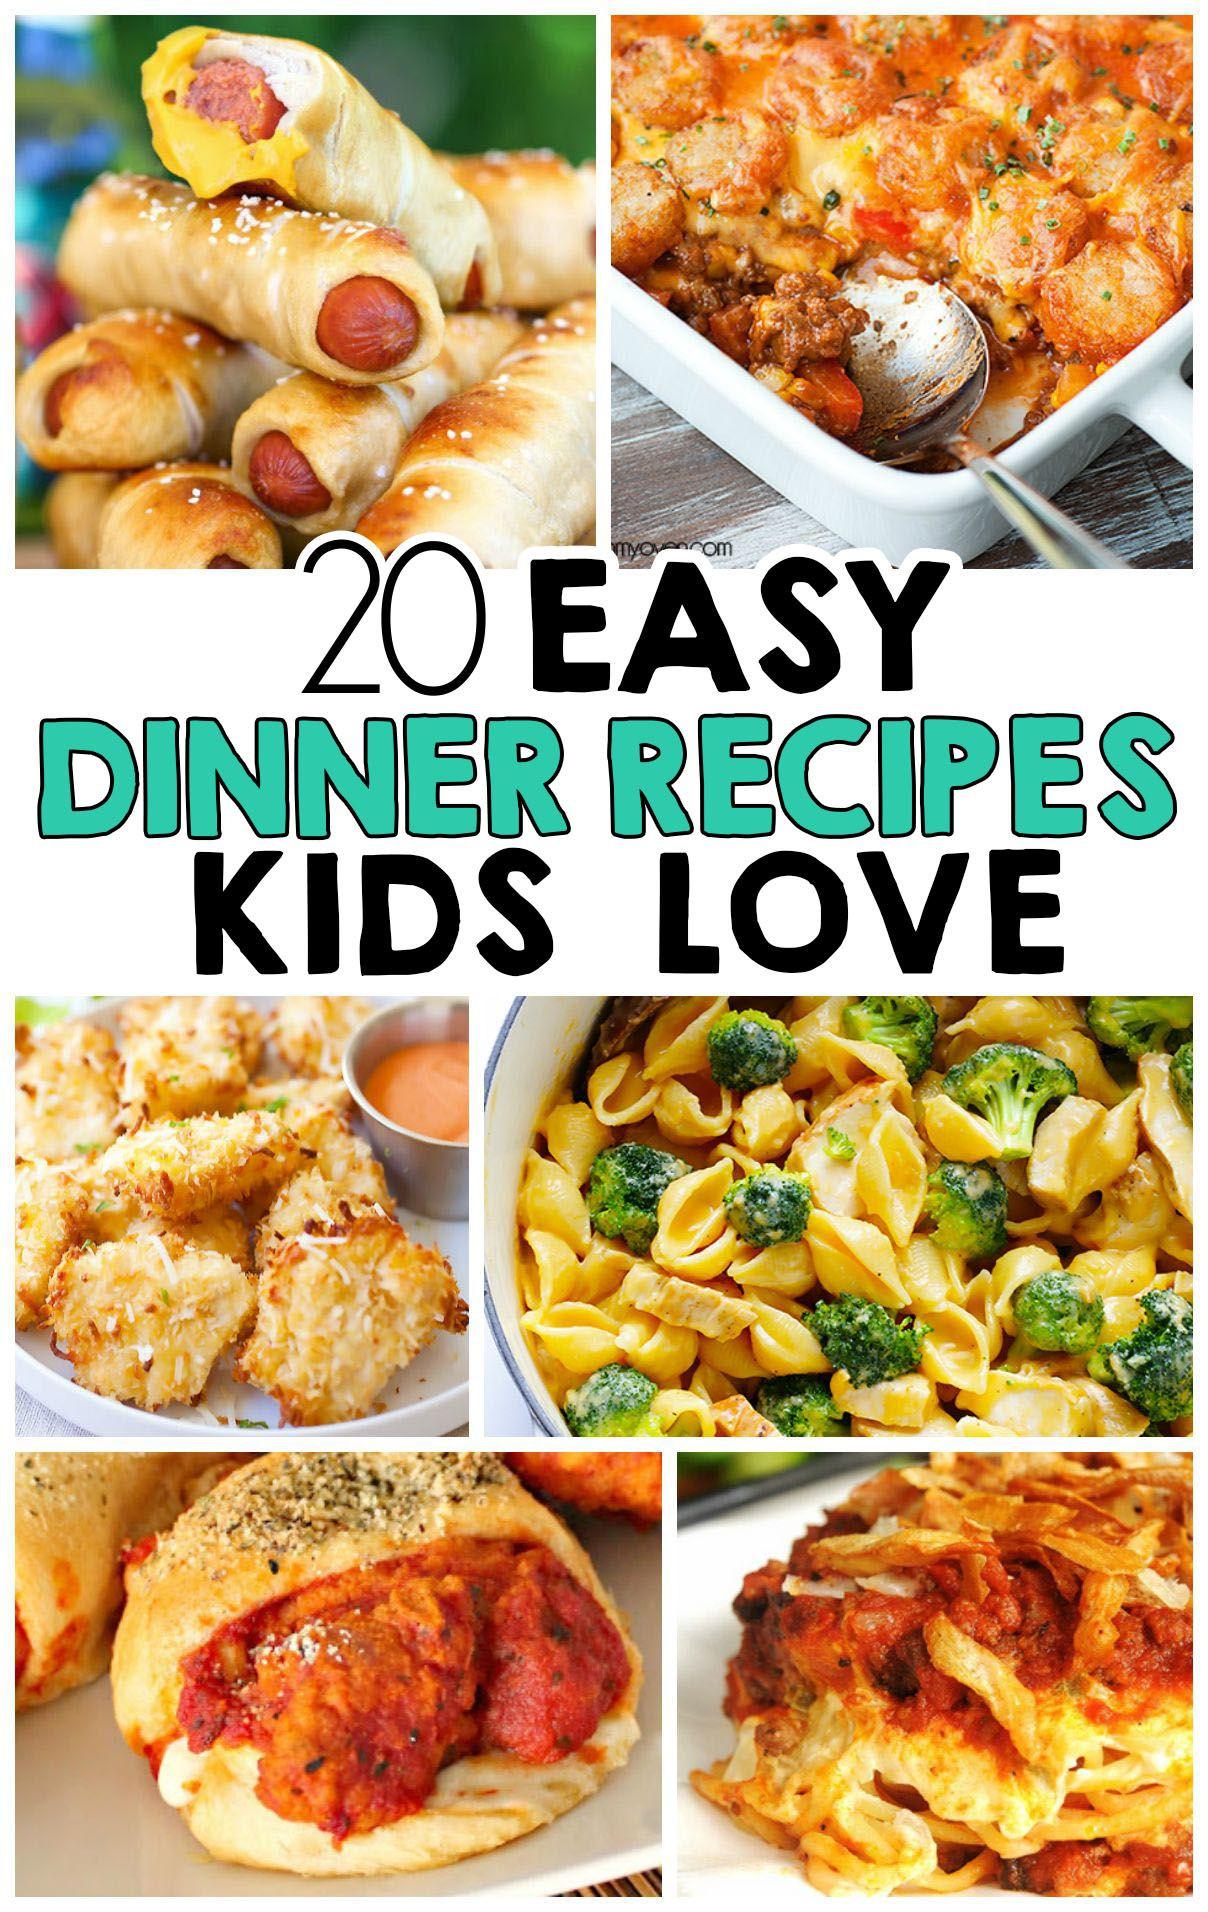 Easy Healthy Dinner Recipes  20 Easy Dinner Recipes That Kids Love